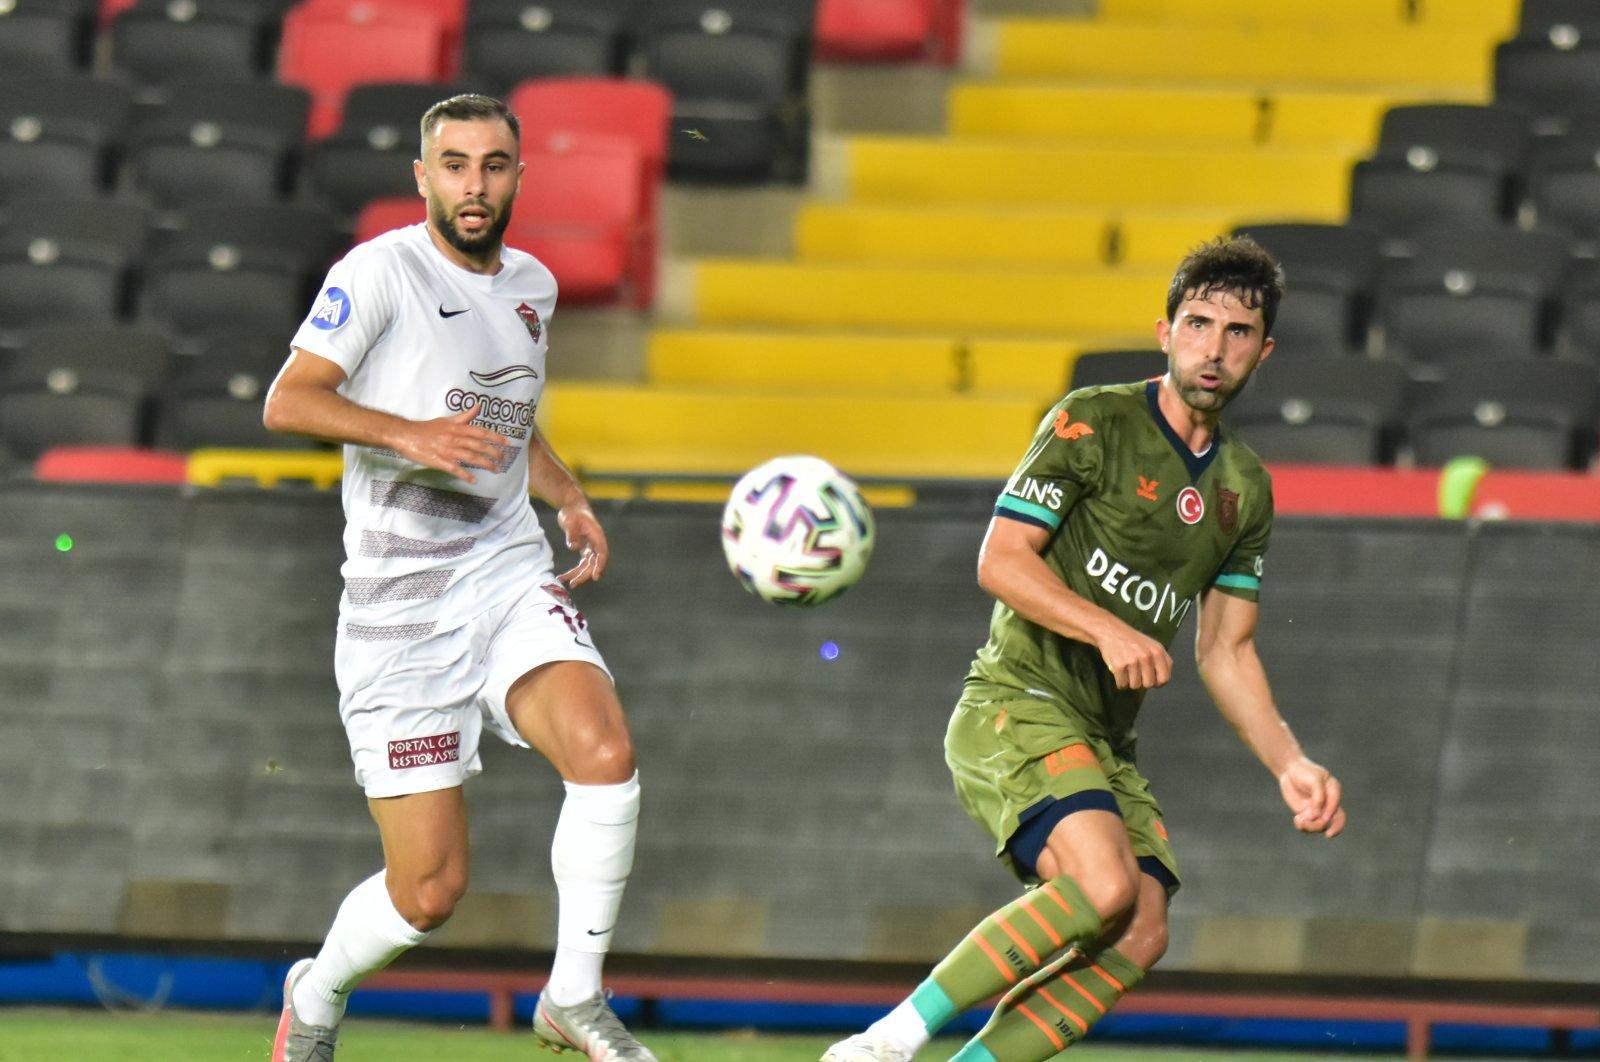 Hatayspor's Selim Ilgaz (L) and Başakşehir's Hasan Ali Kaldırım vie for the ball during a Süper Lig match in Hatay, Turkey, Sept. 14, 2020. (AA Photo)